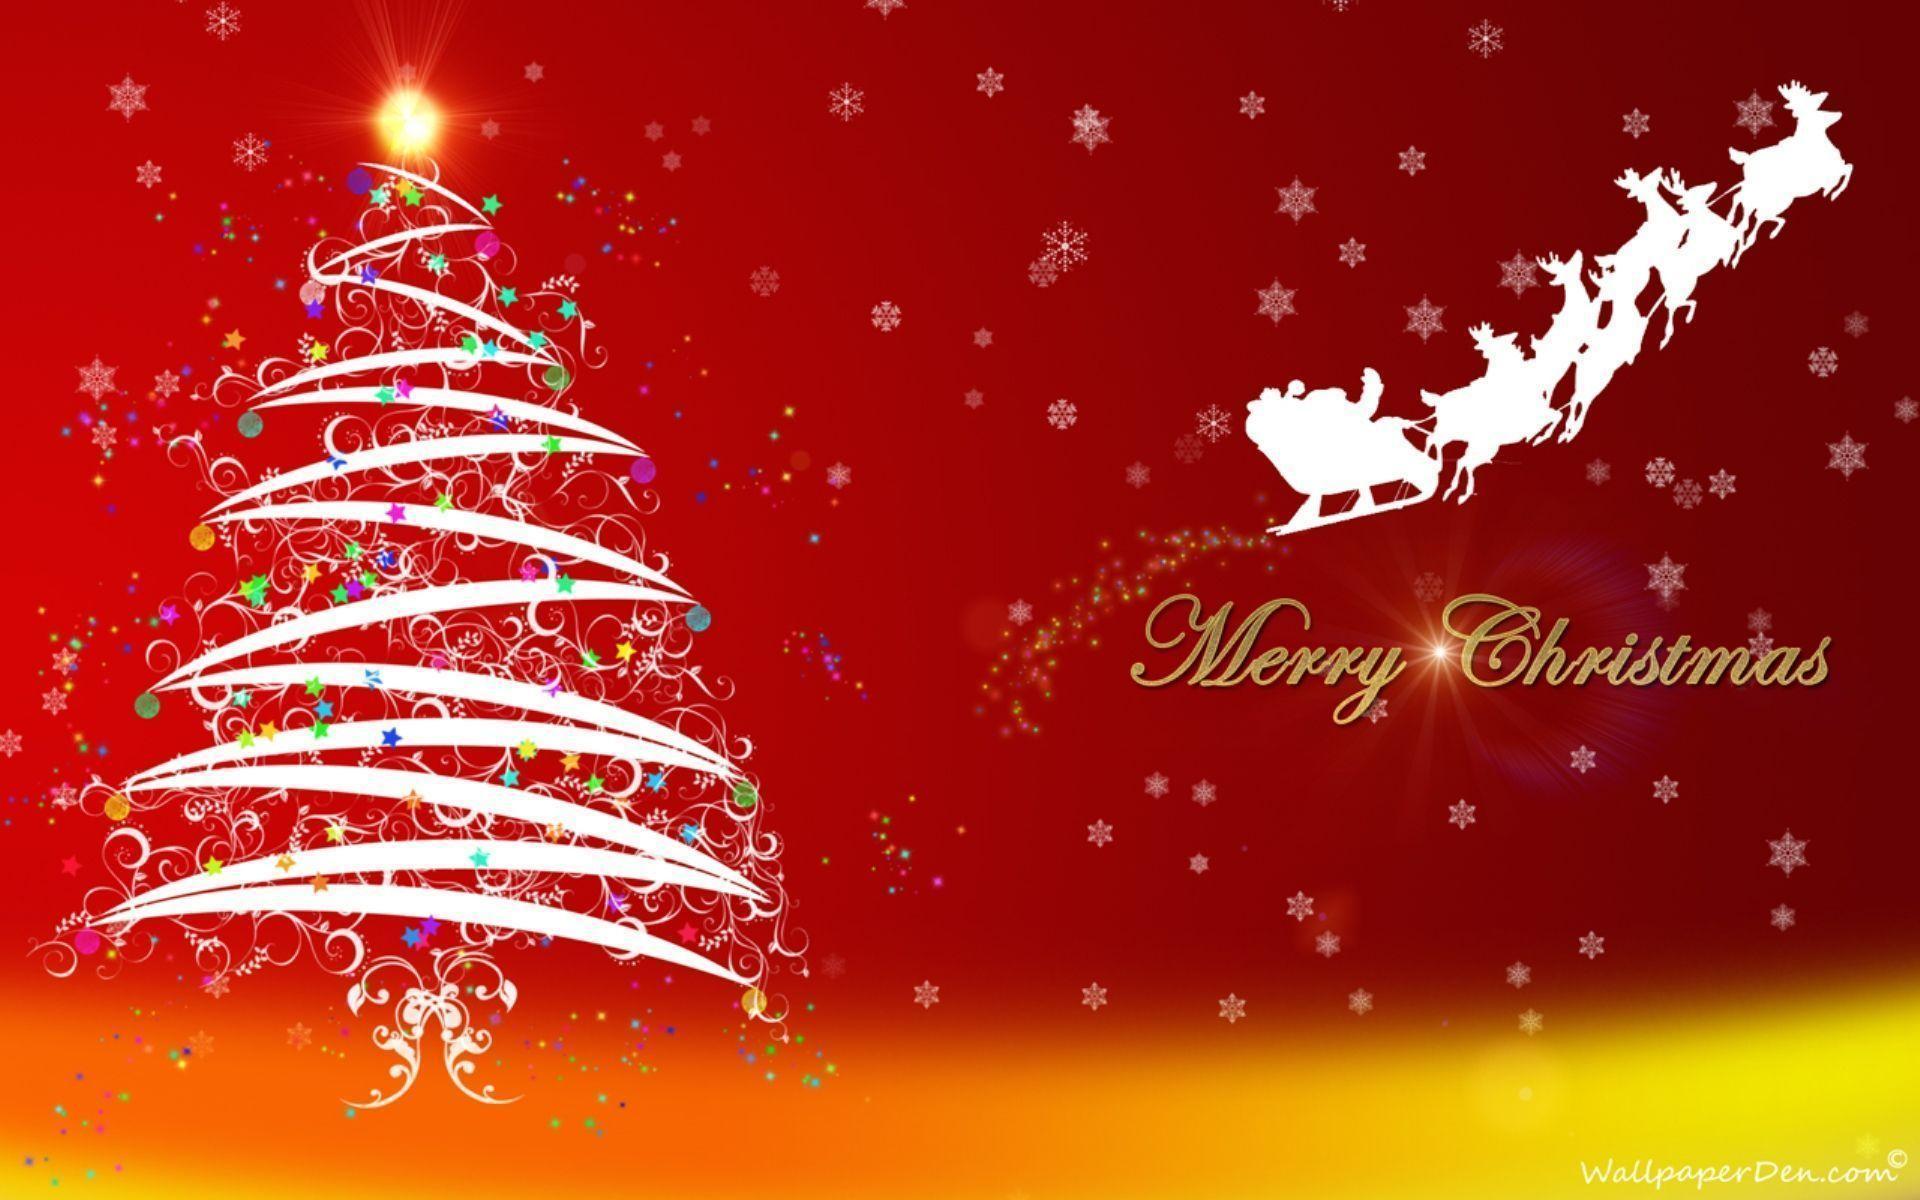 Christmas Wallpapers Hd 1080p: HD Wallpapers 1080p 2015